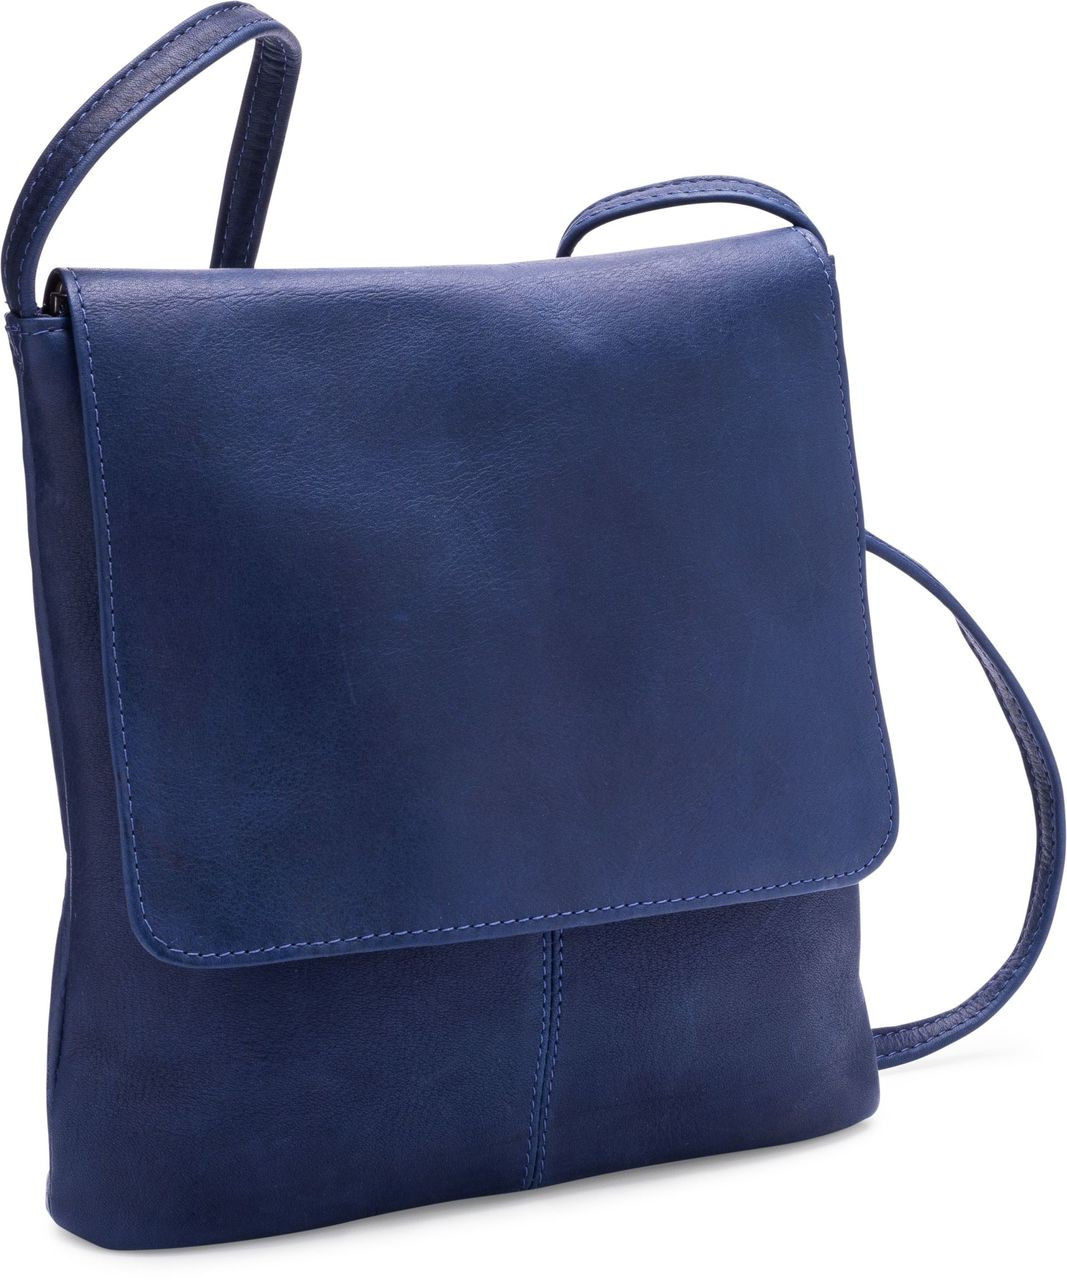 063a31509624 Simple Flap Over Crossbody Bag